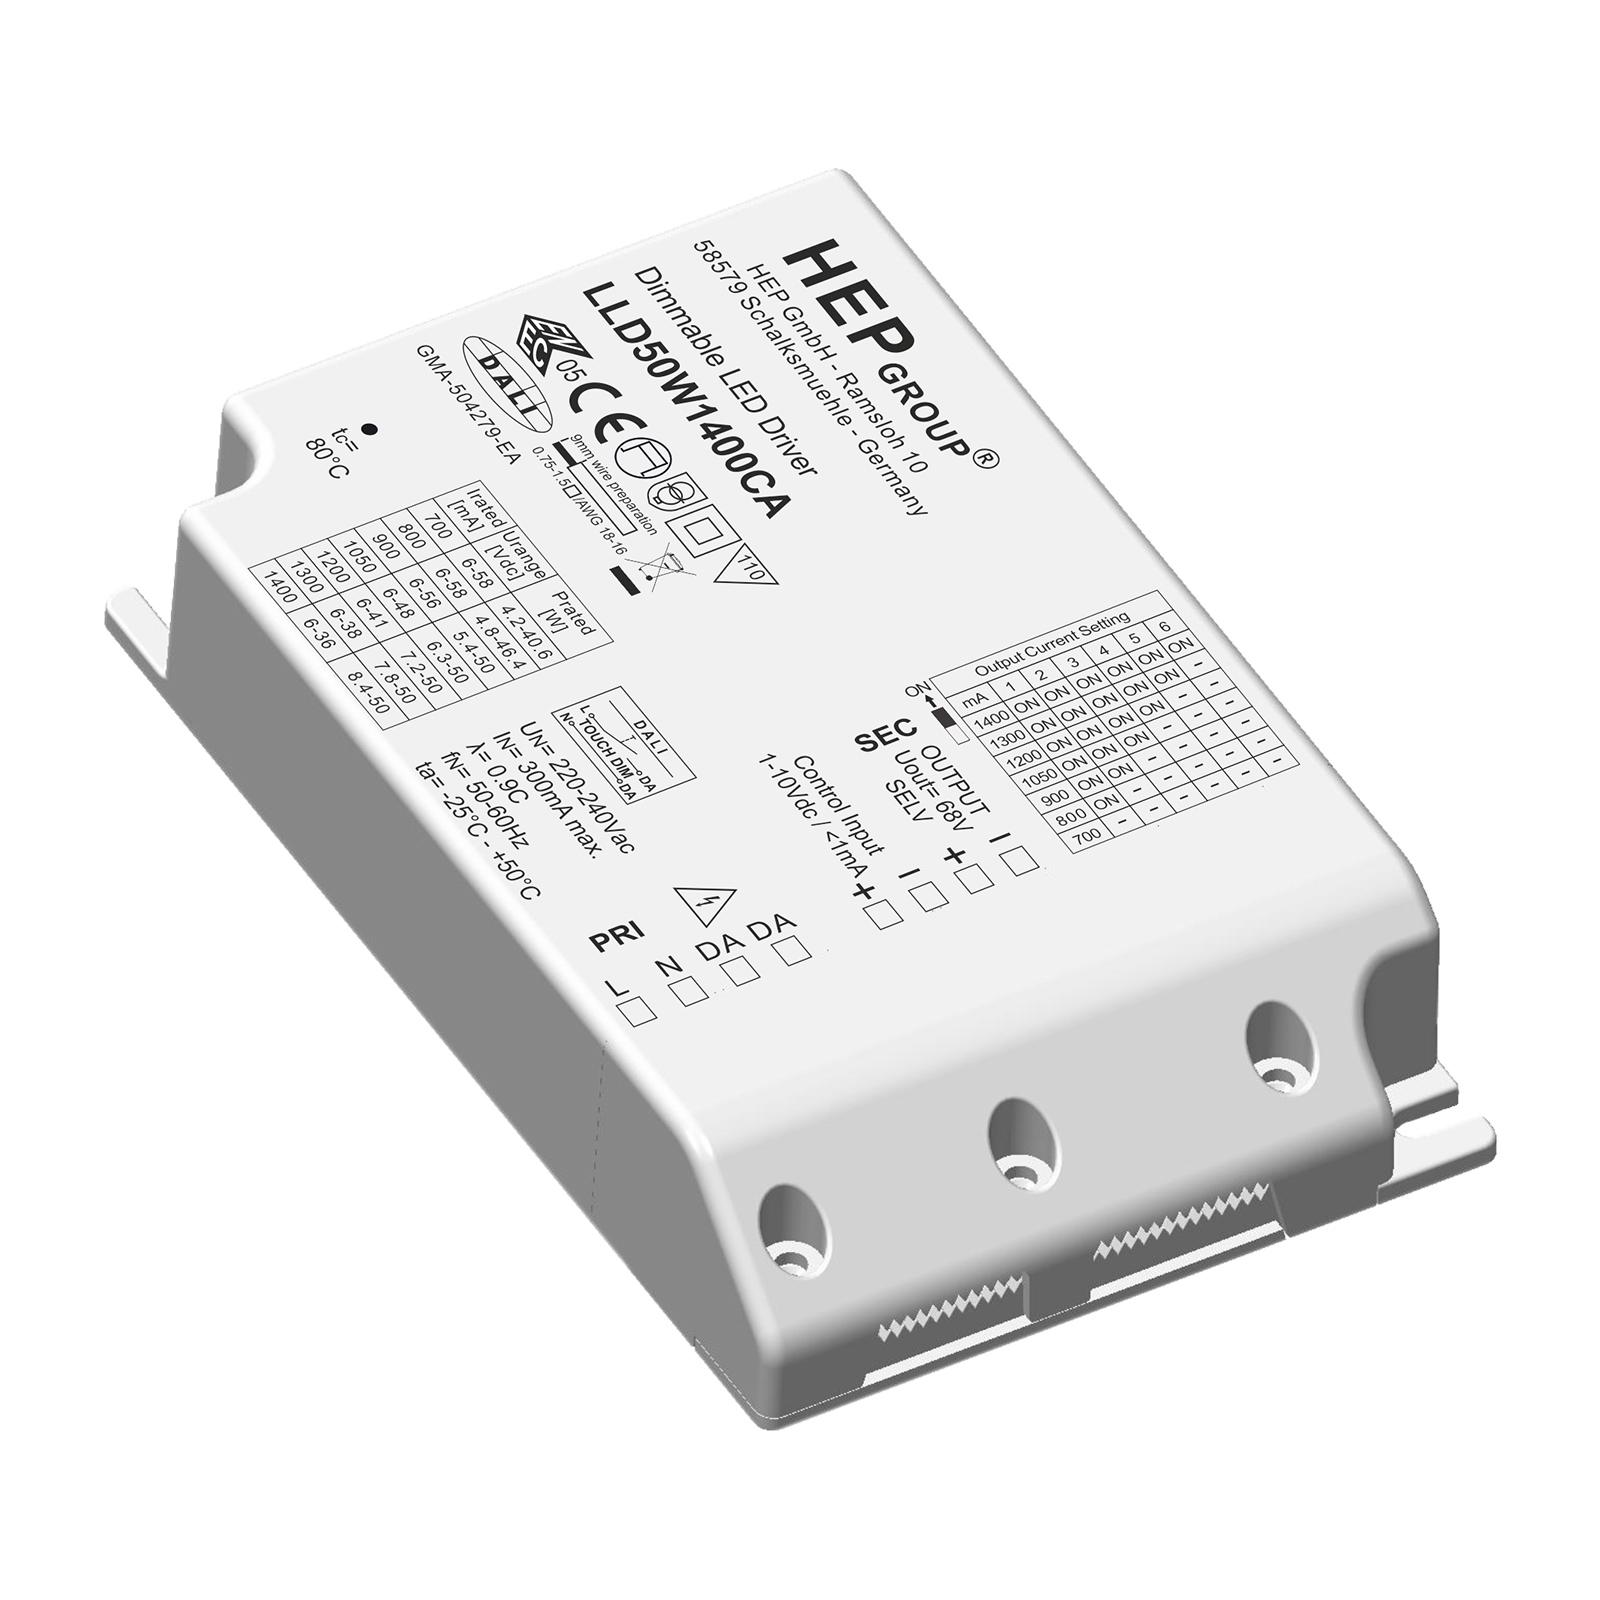 LED-driver LLD, 50 W, 1400 mA, dimbar, CC